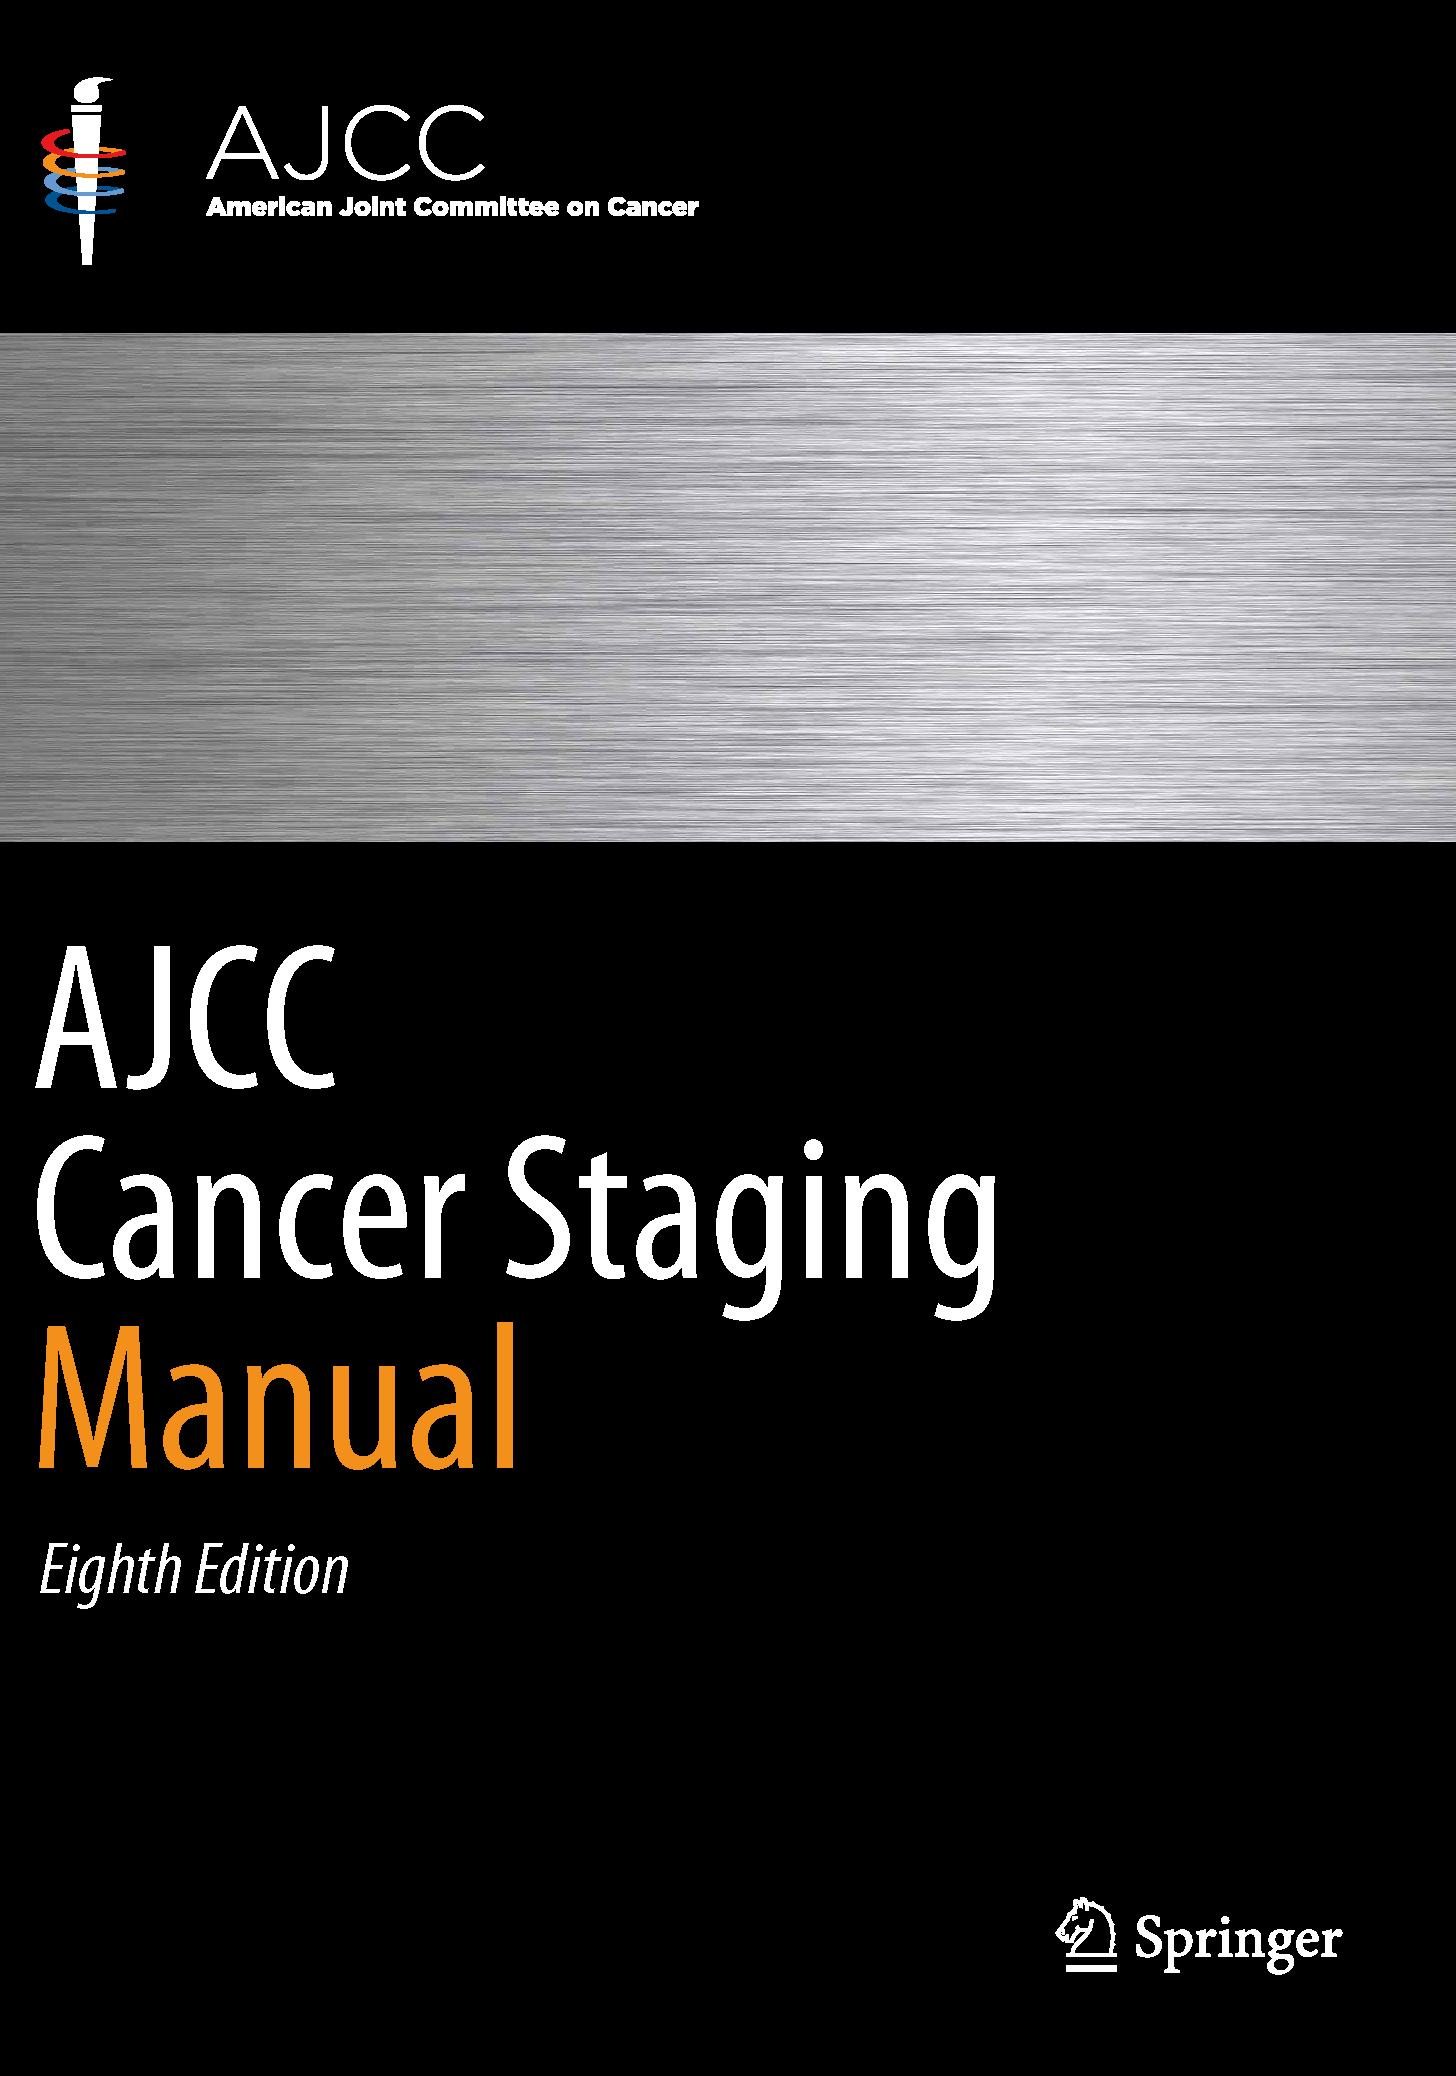 ajcc cancer staging manual pdf